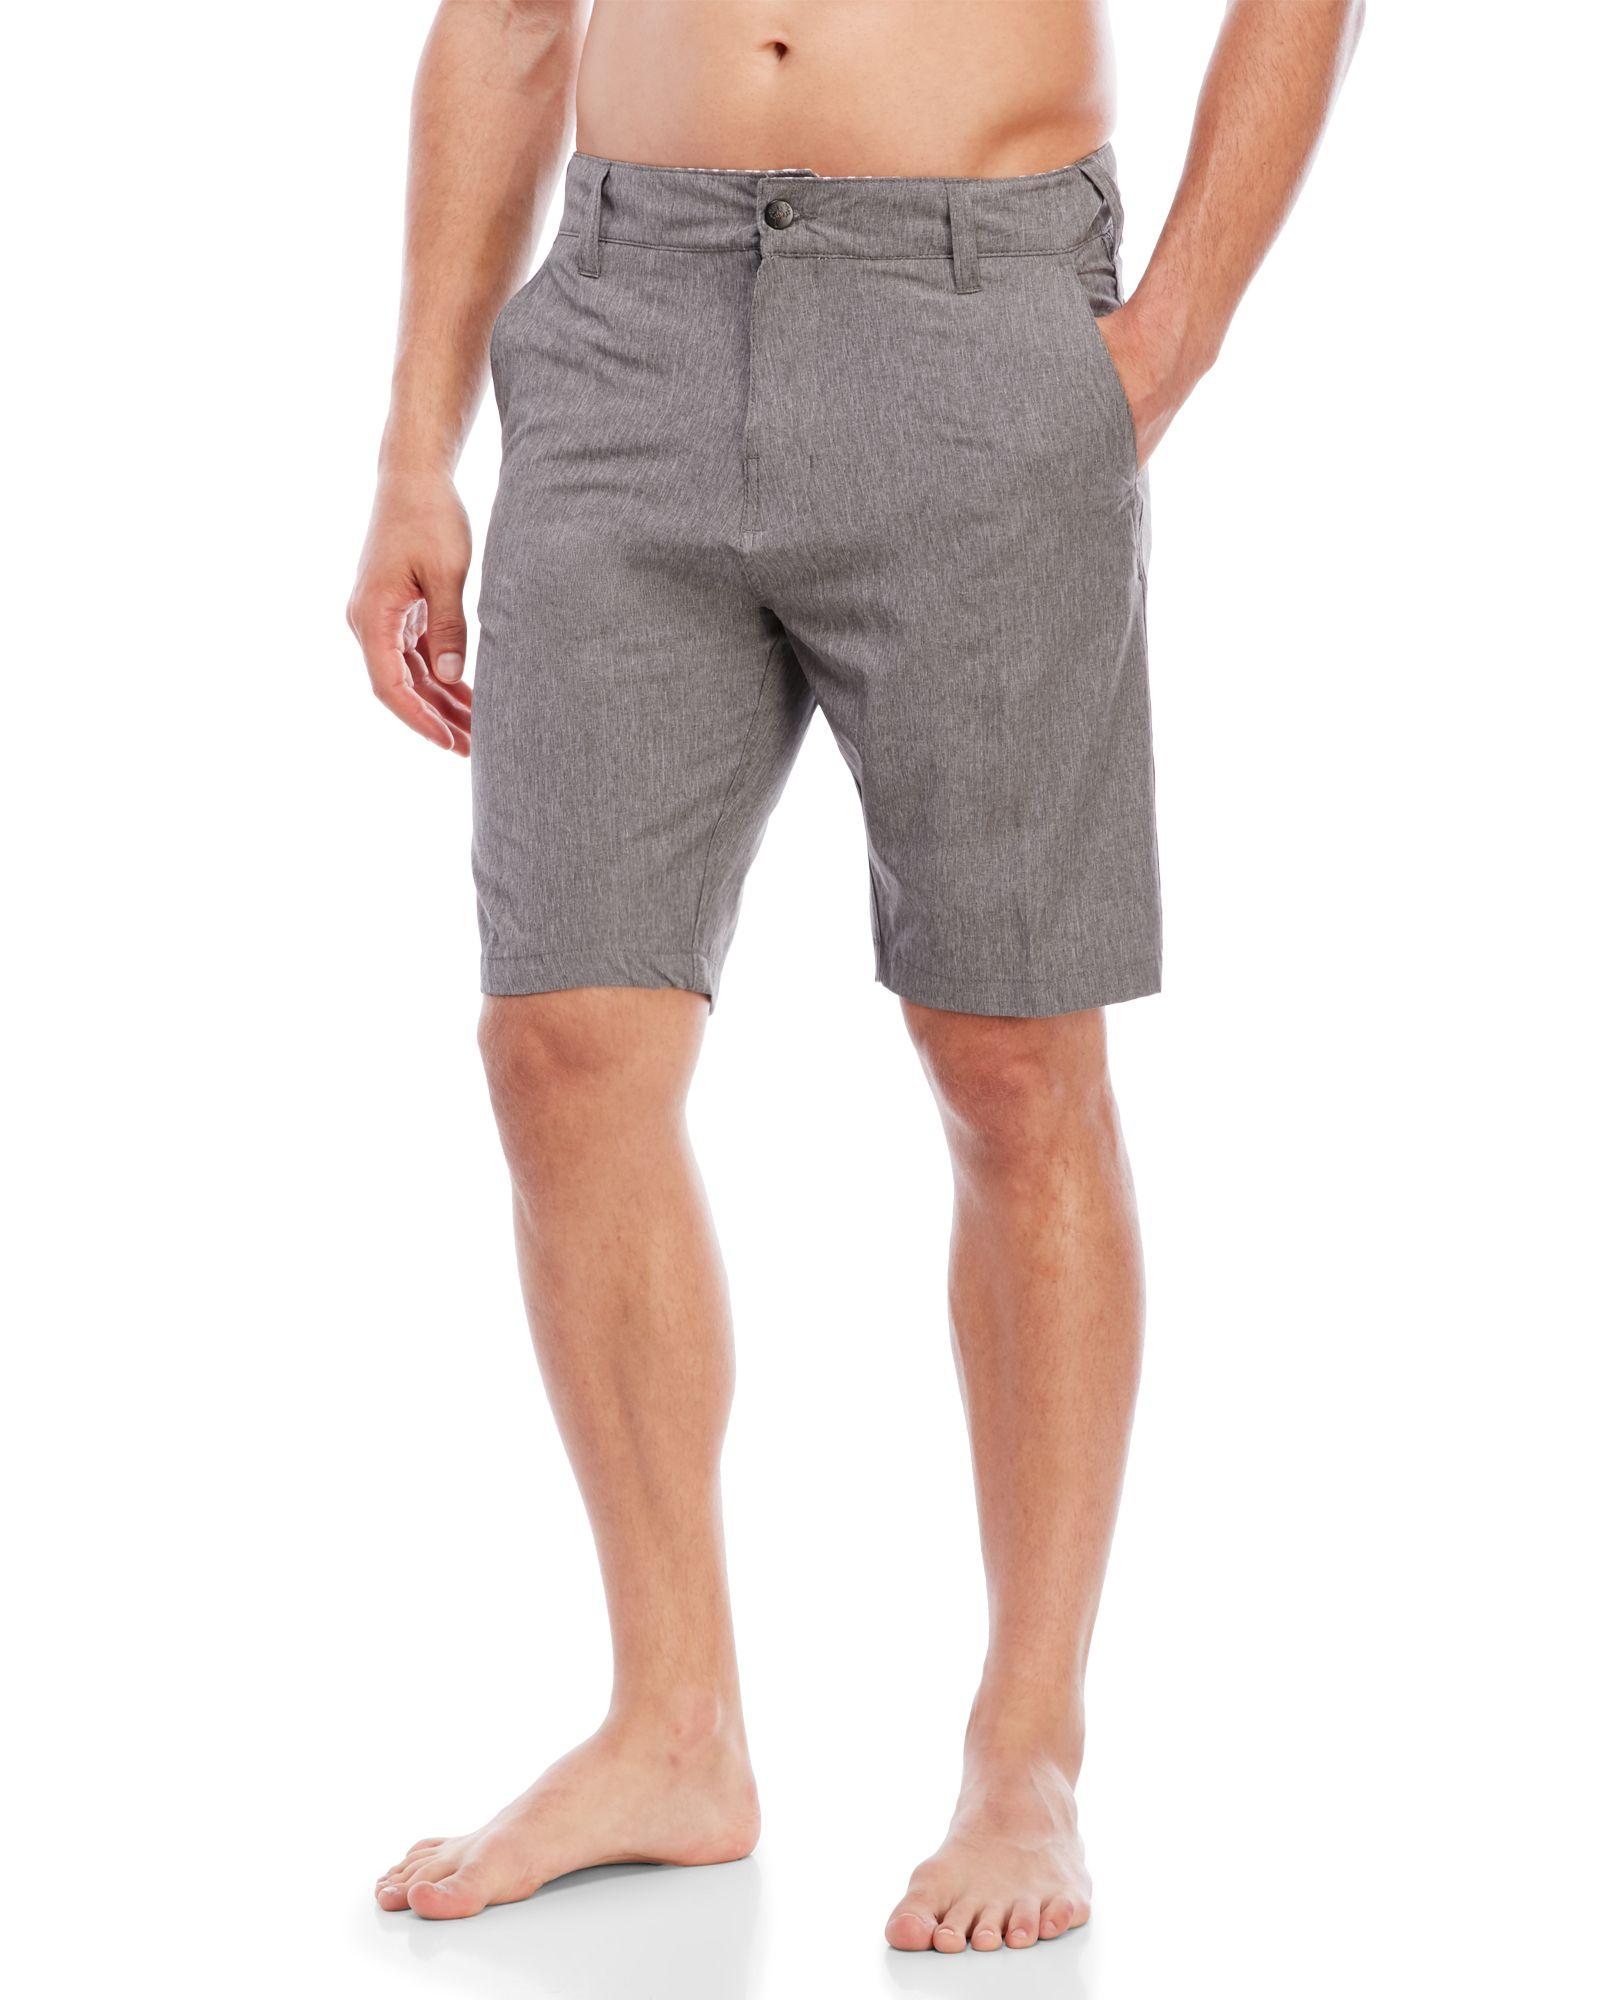 99c0bf8ab3 Trunks Surf & Swim Co. Multi-Functional Shorts | *Apparel ...